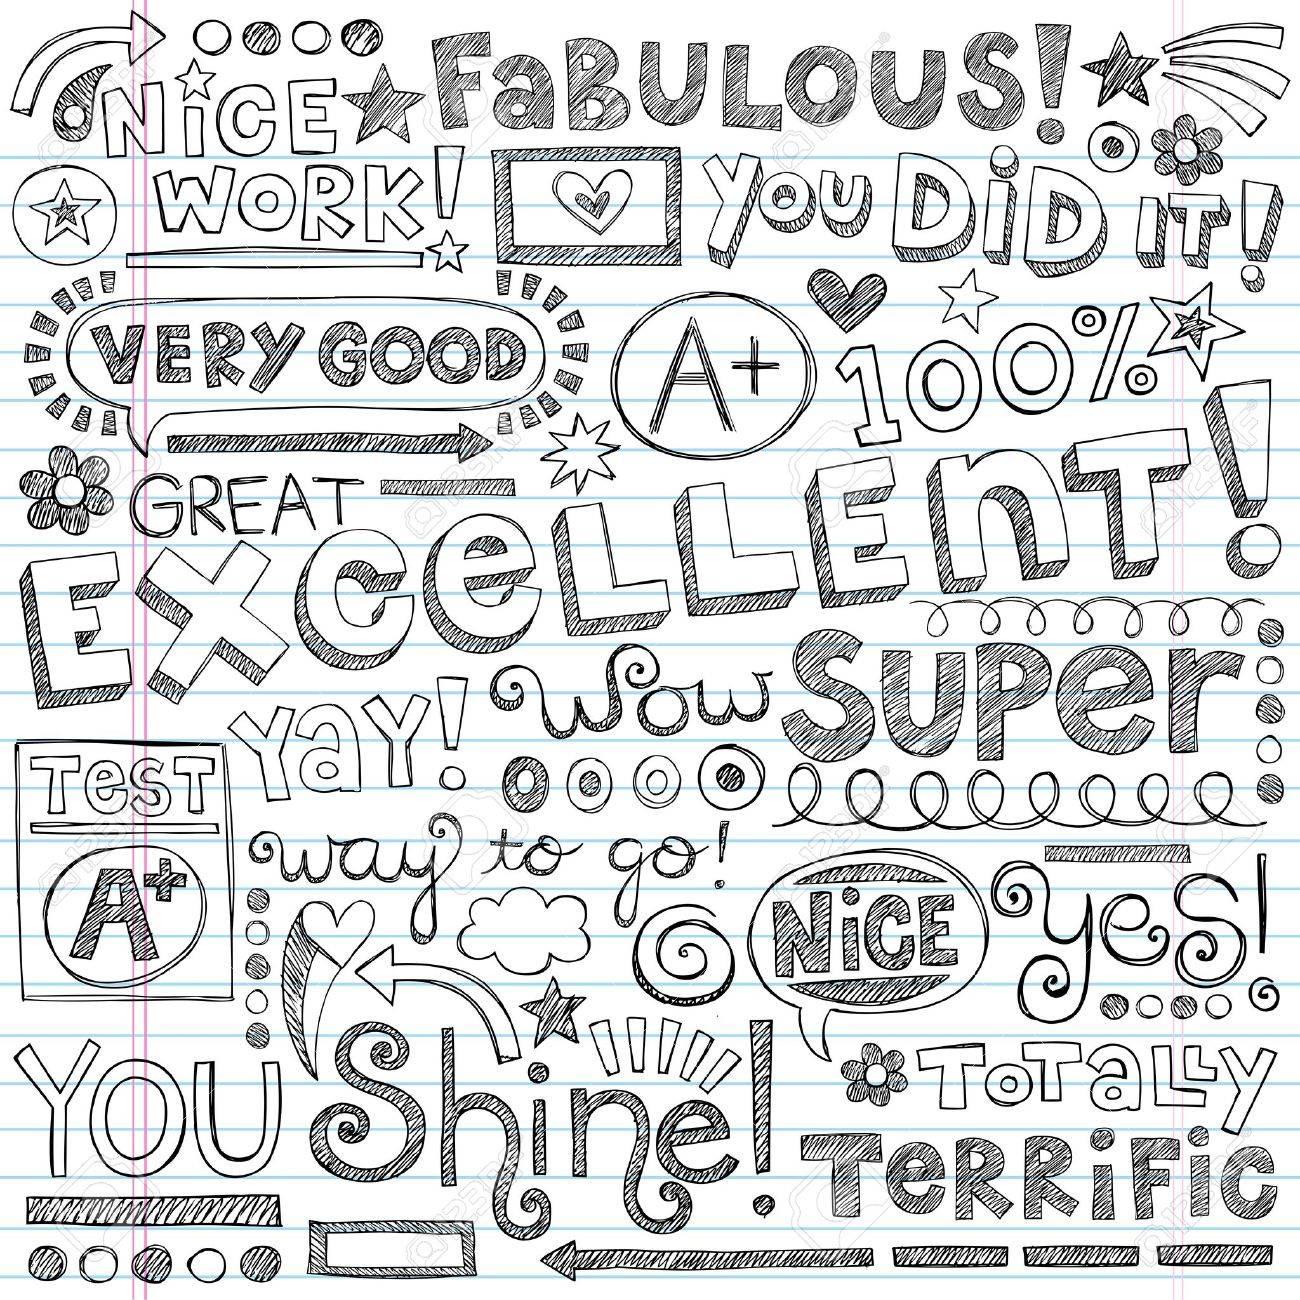 Super Excellent Student Praise Words of Encouragement Stock Vector - 21863067